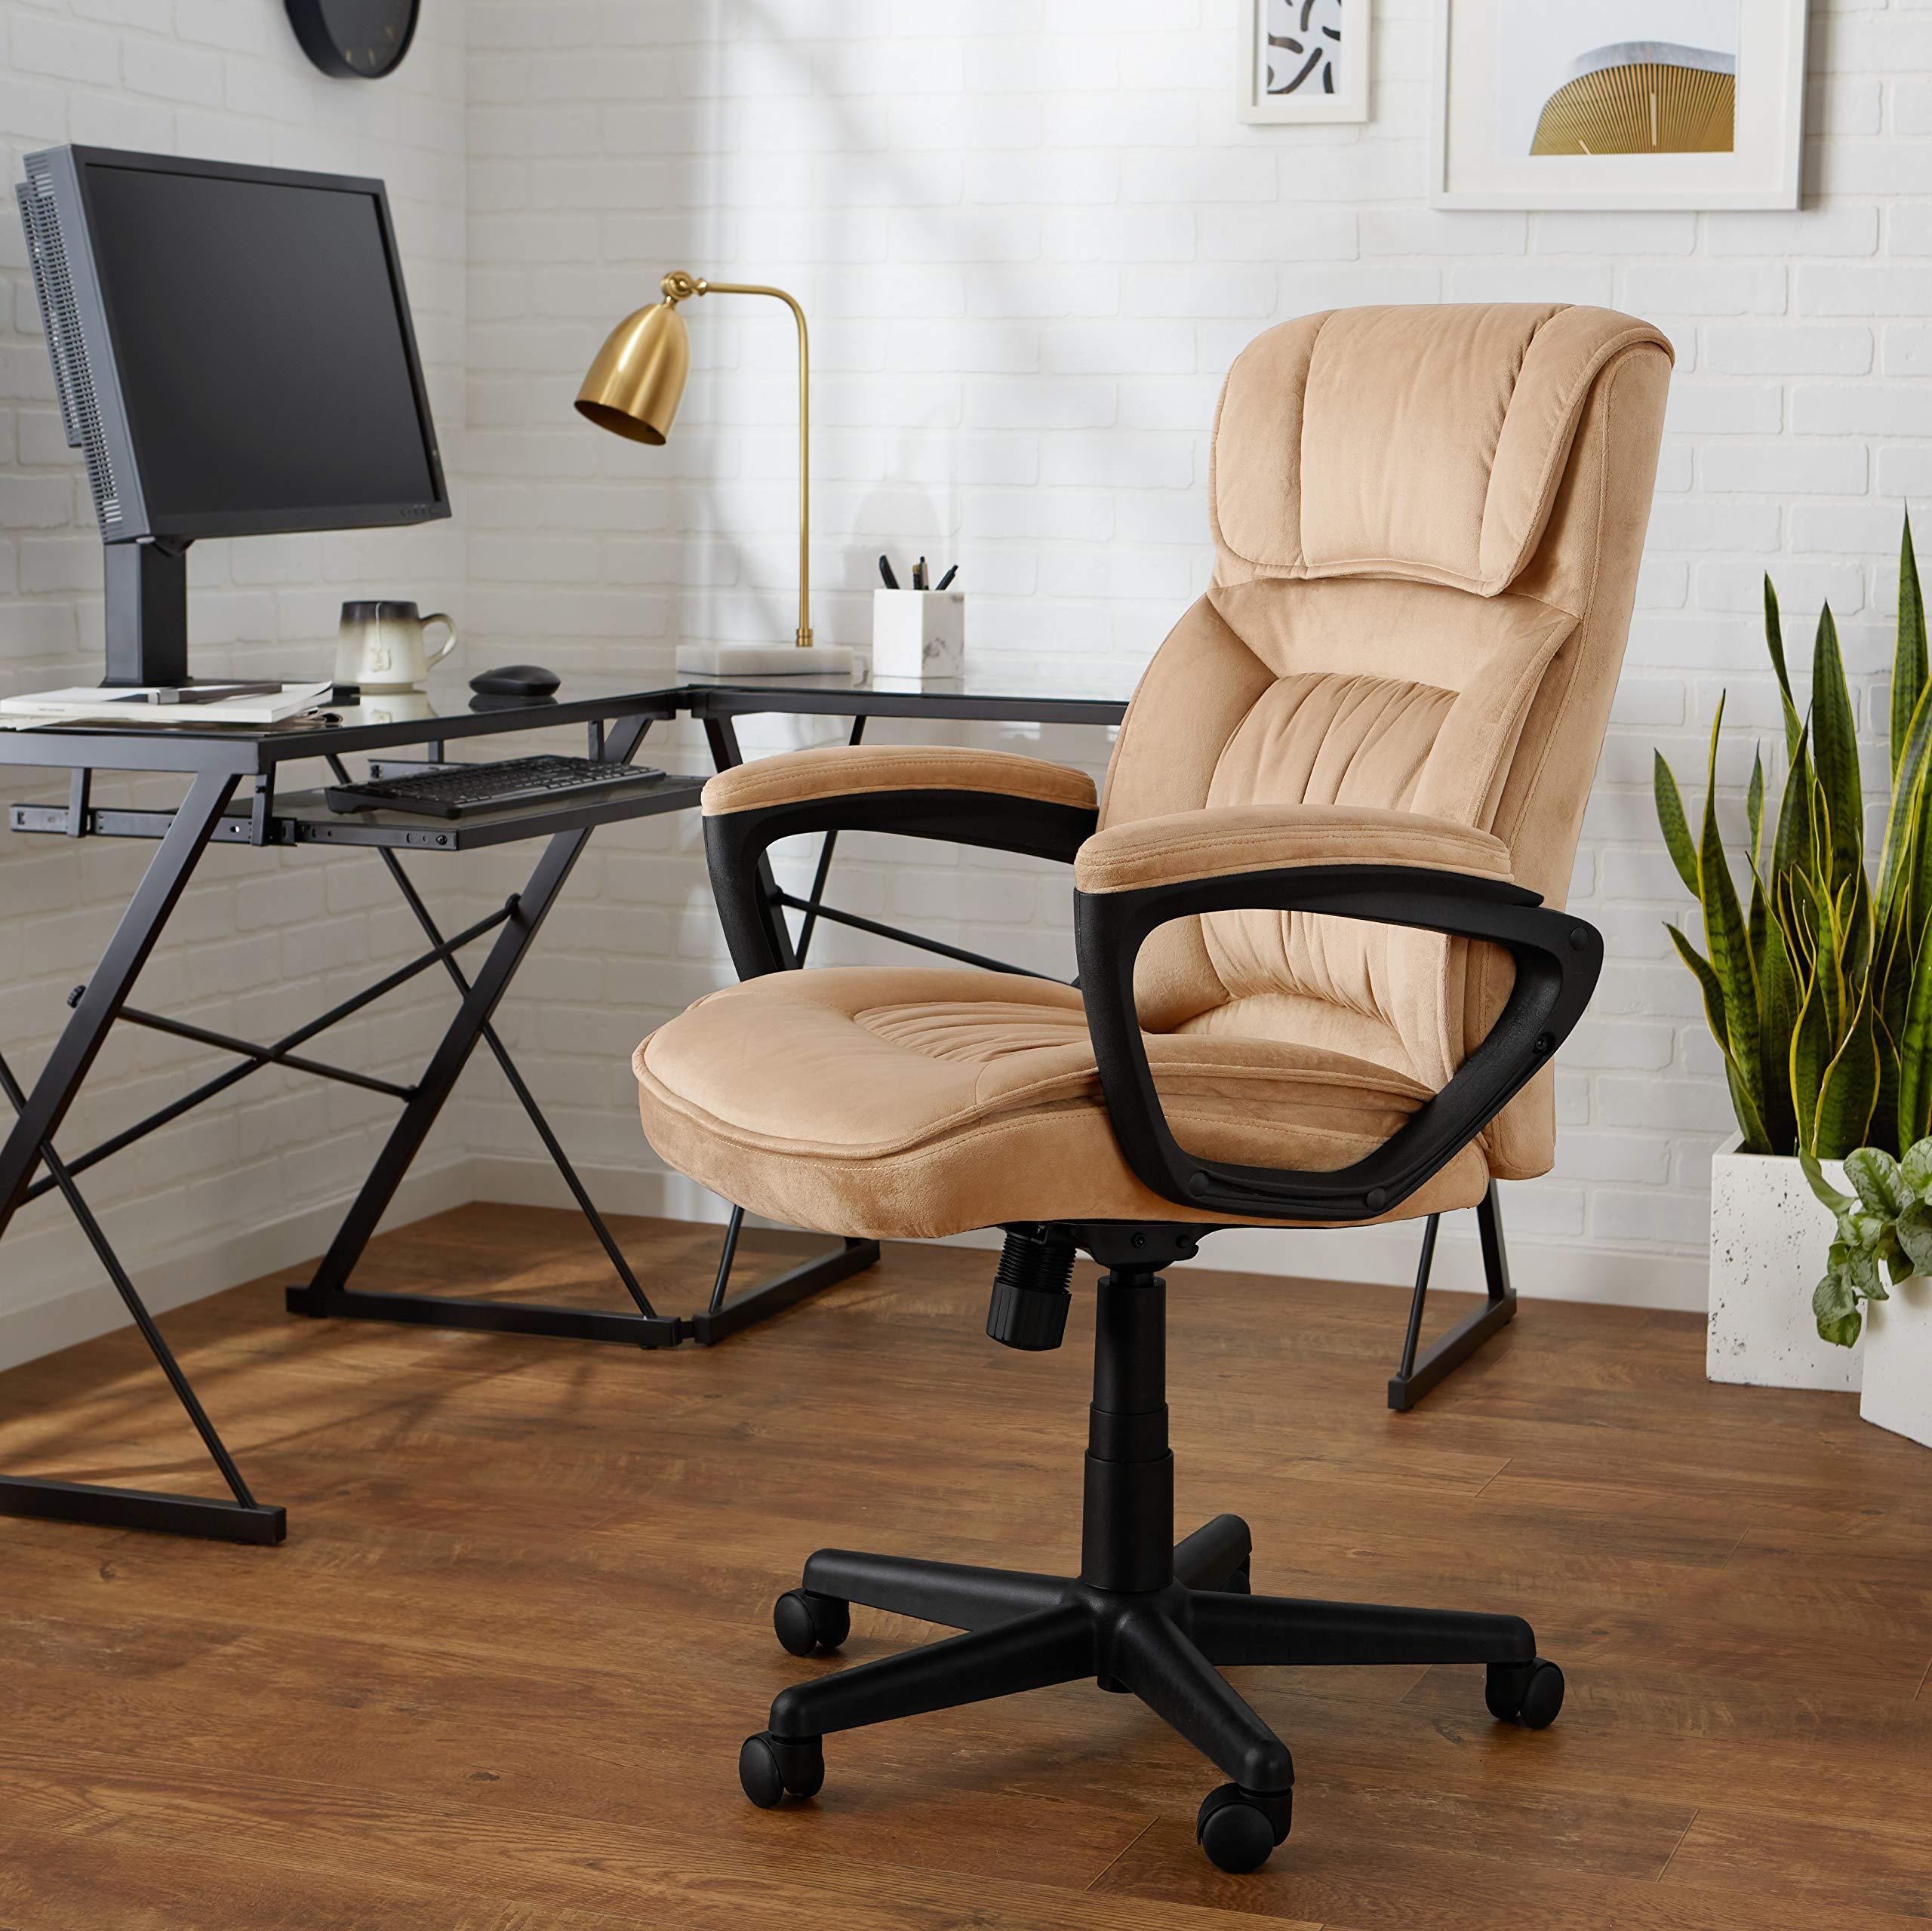 AmazonBasics Classic Office Chair - Adjustable, Swiveling, Microfiber Cover - Light Beige by AmazonBasics (Image #3)